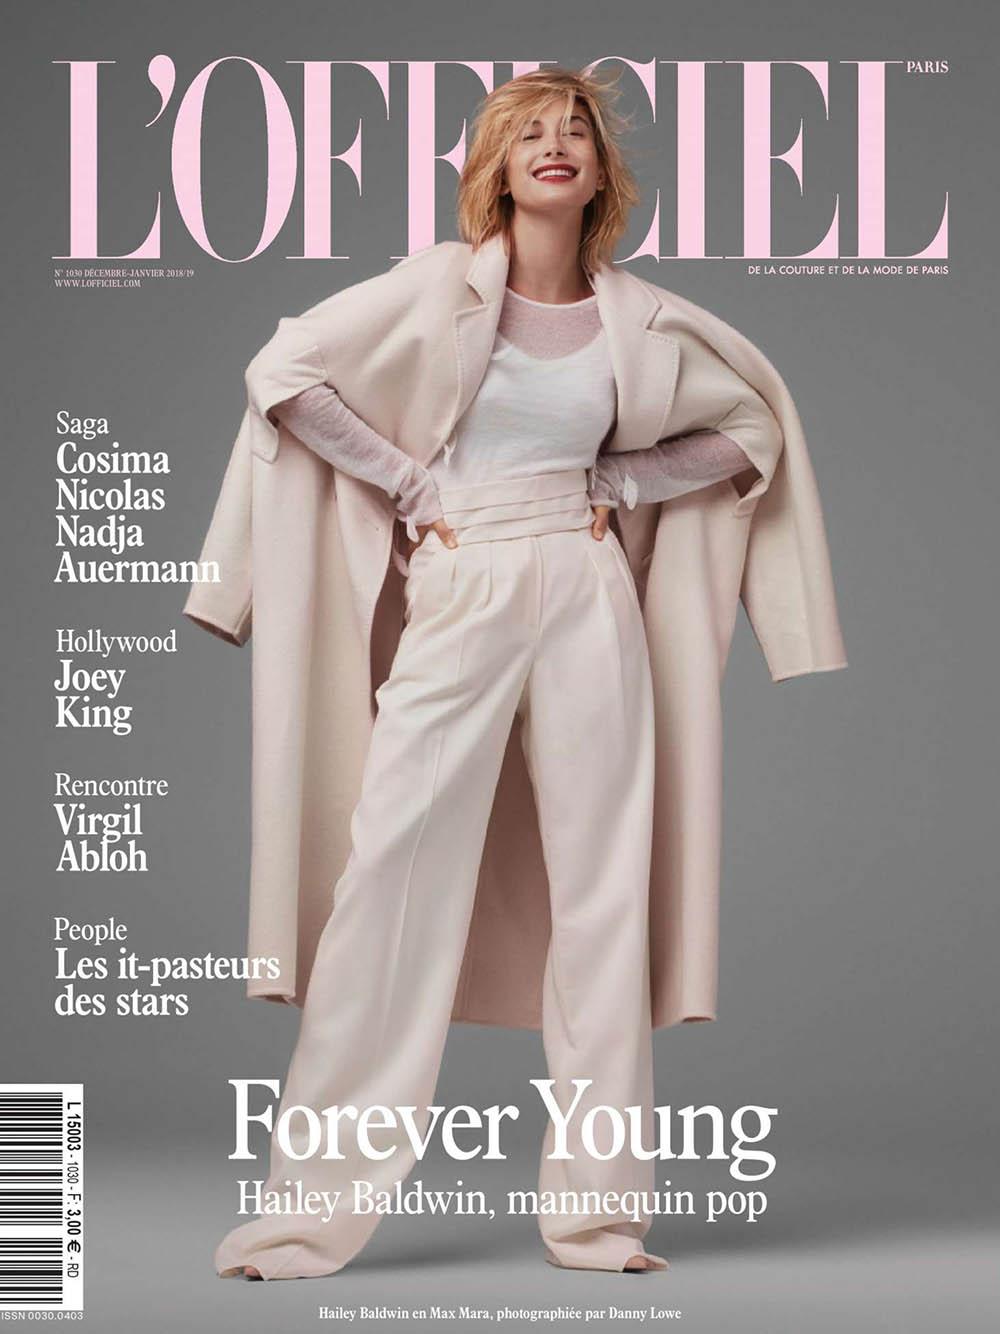 Hailey Baldwin covers L'Officiel Paris December 2018 January 2019 by Danny Lowe